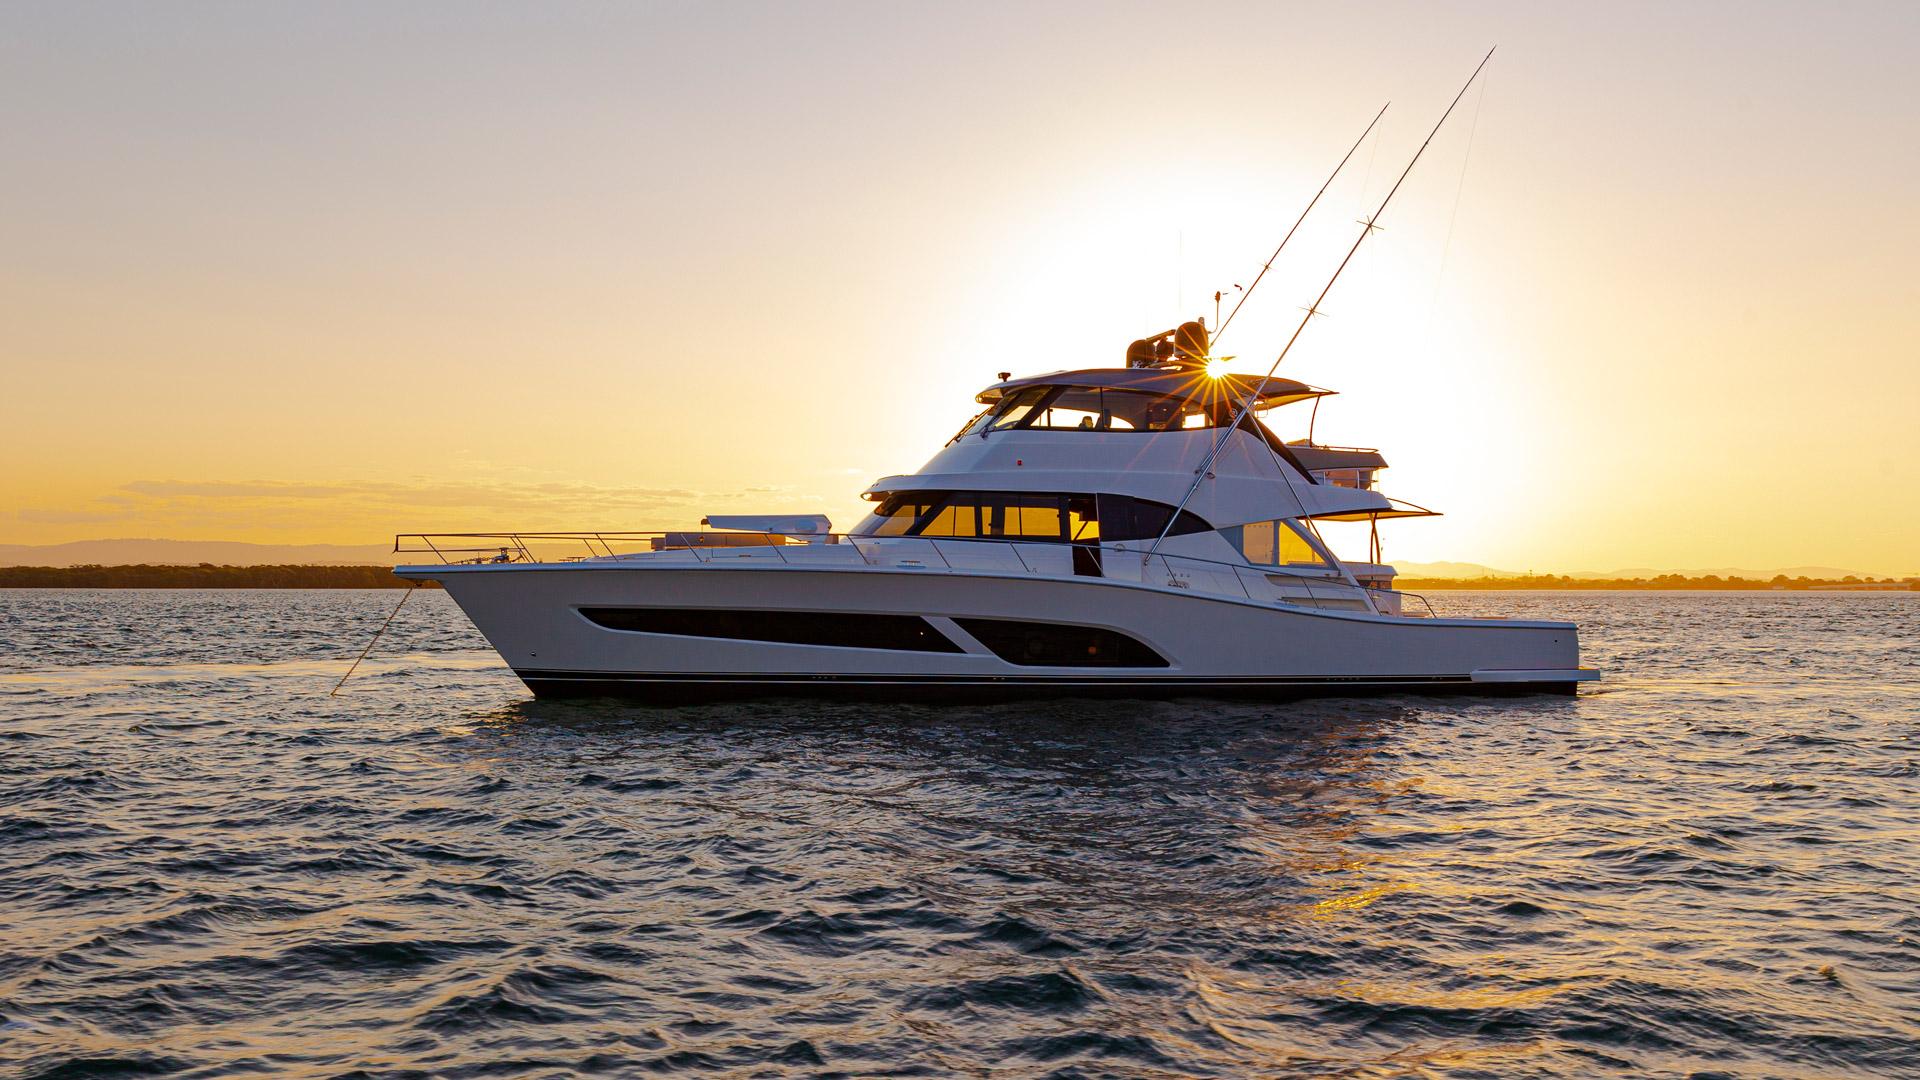 Riviera 72 Sports Motor Yacht Sunset 001